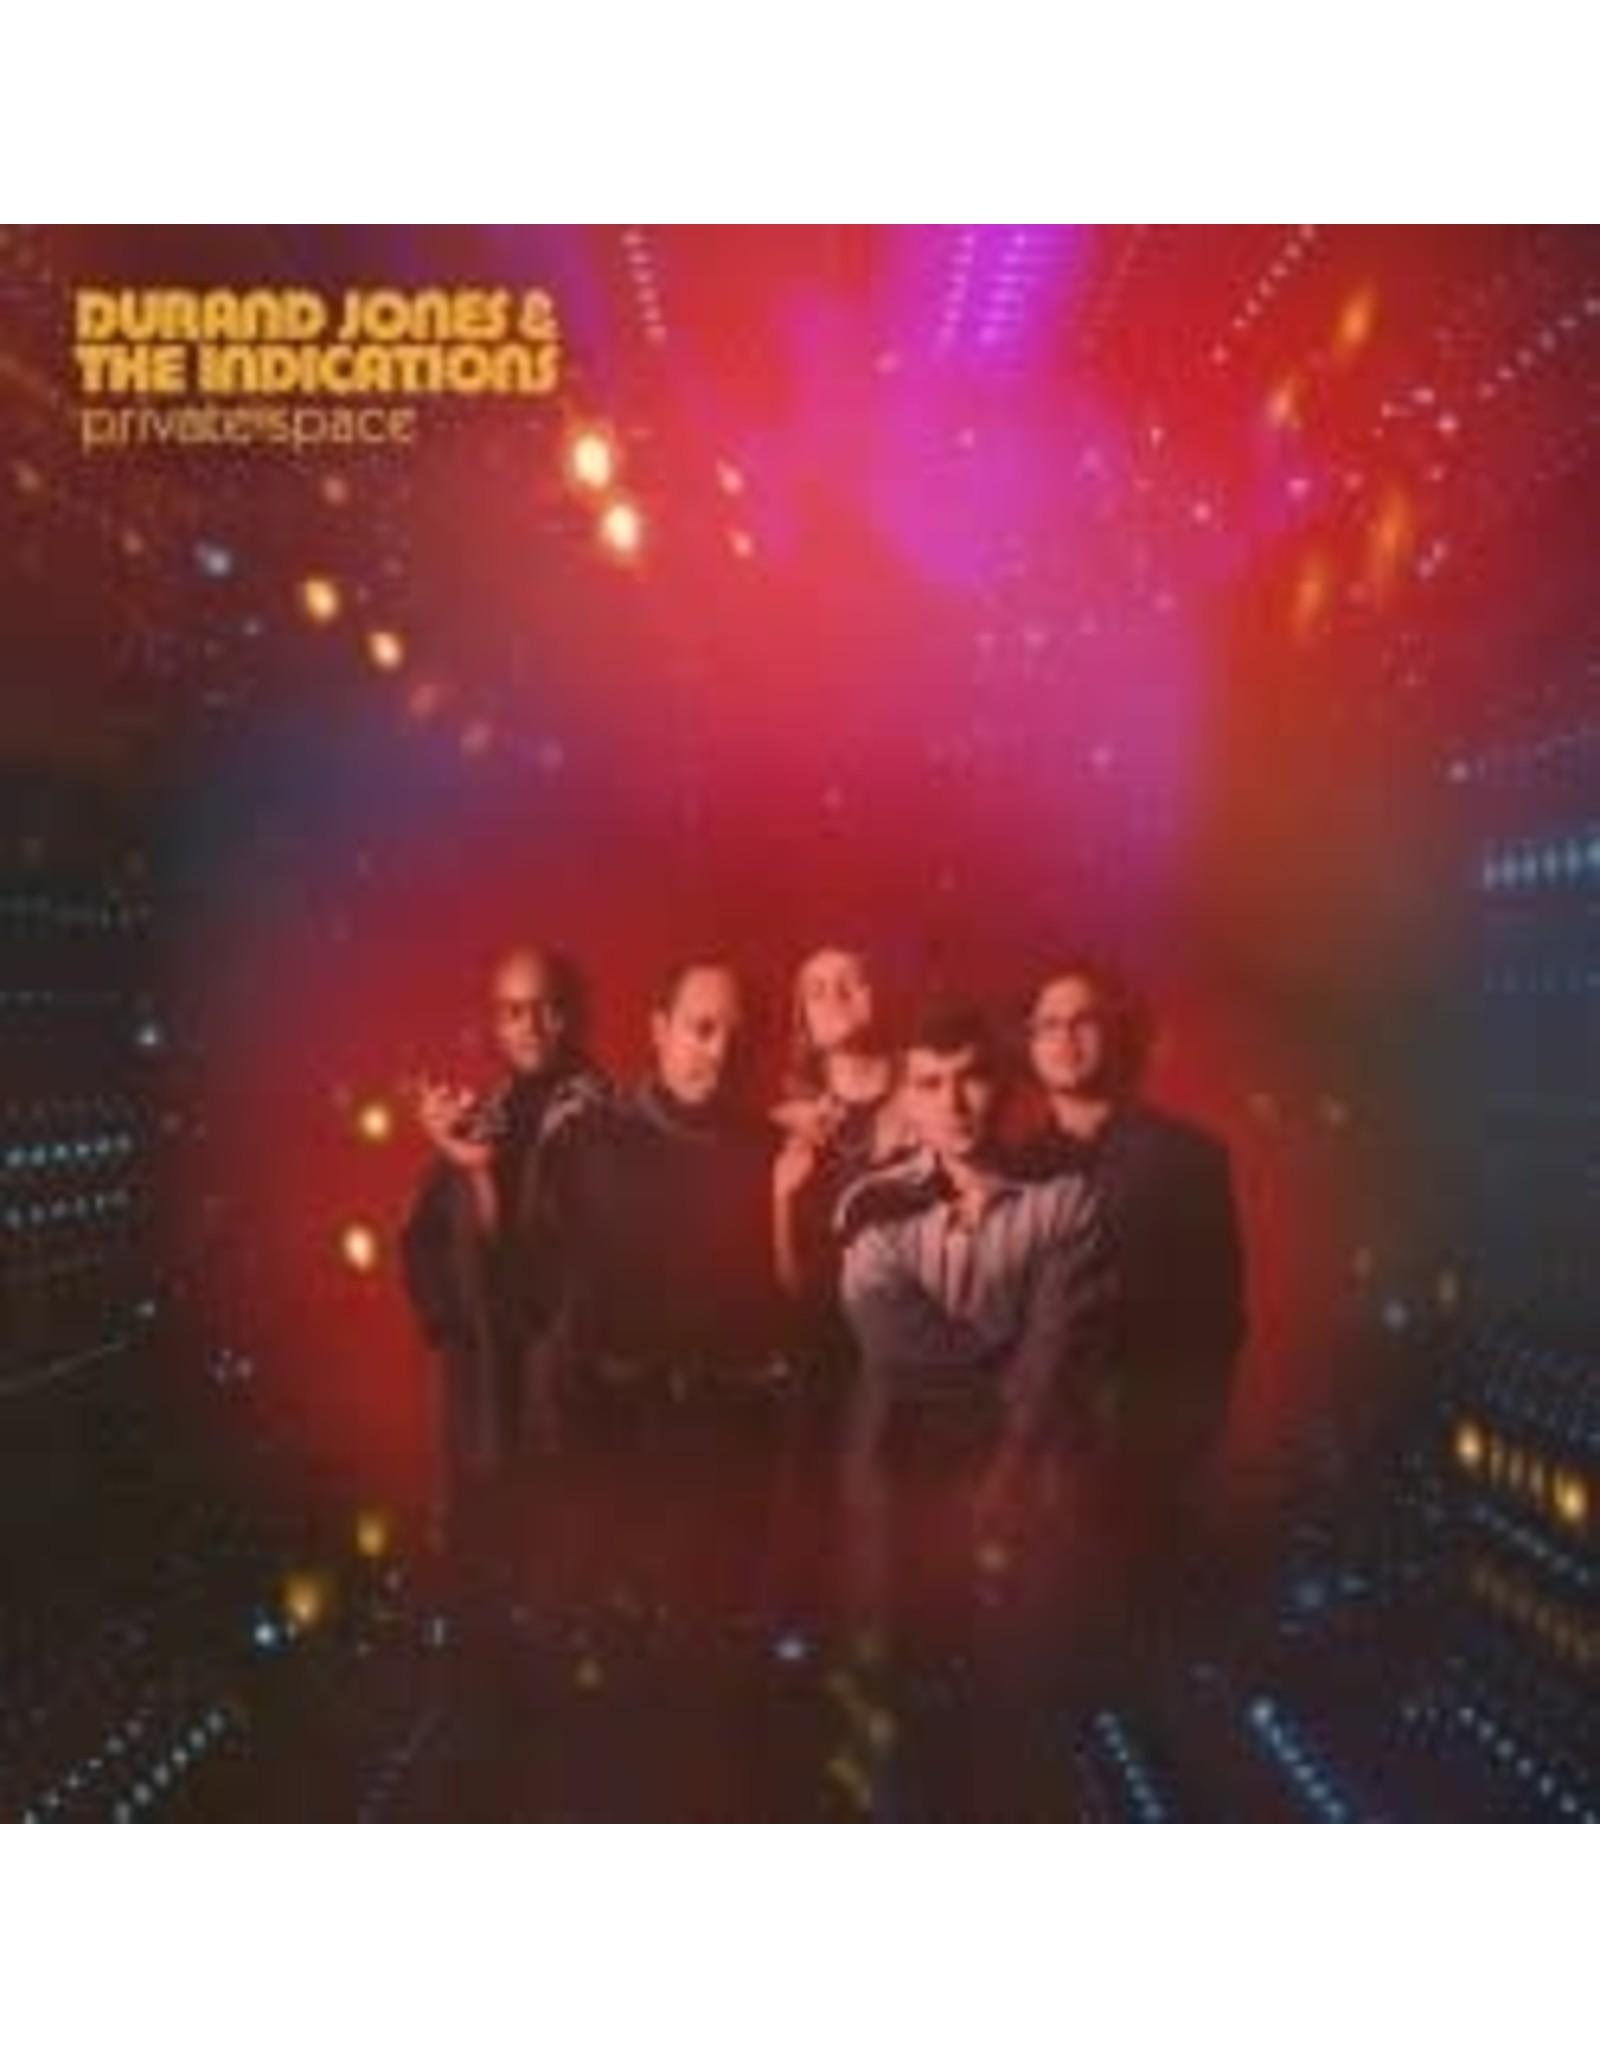 Durand Jones & The Indicators - Private Space LP (Ltd Red Nebula vinyl)